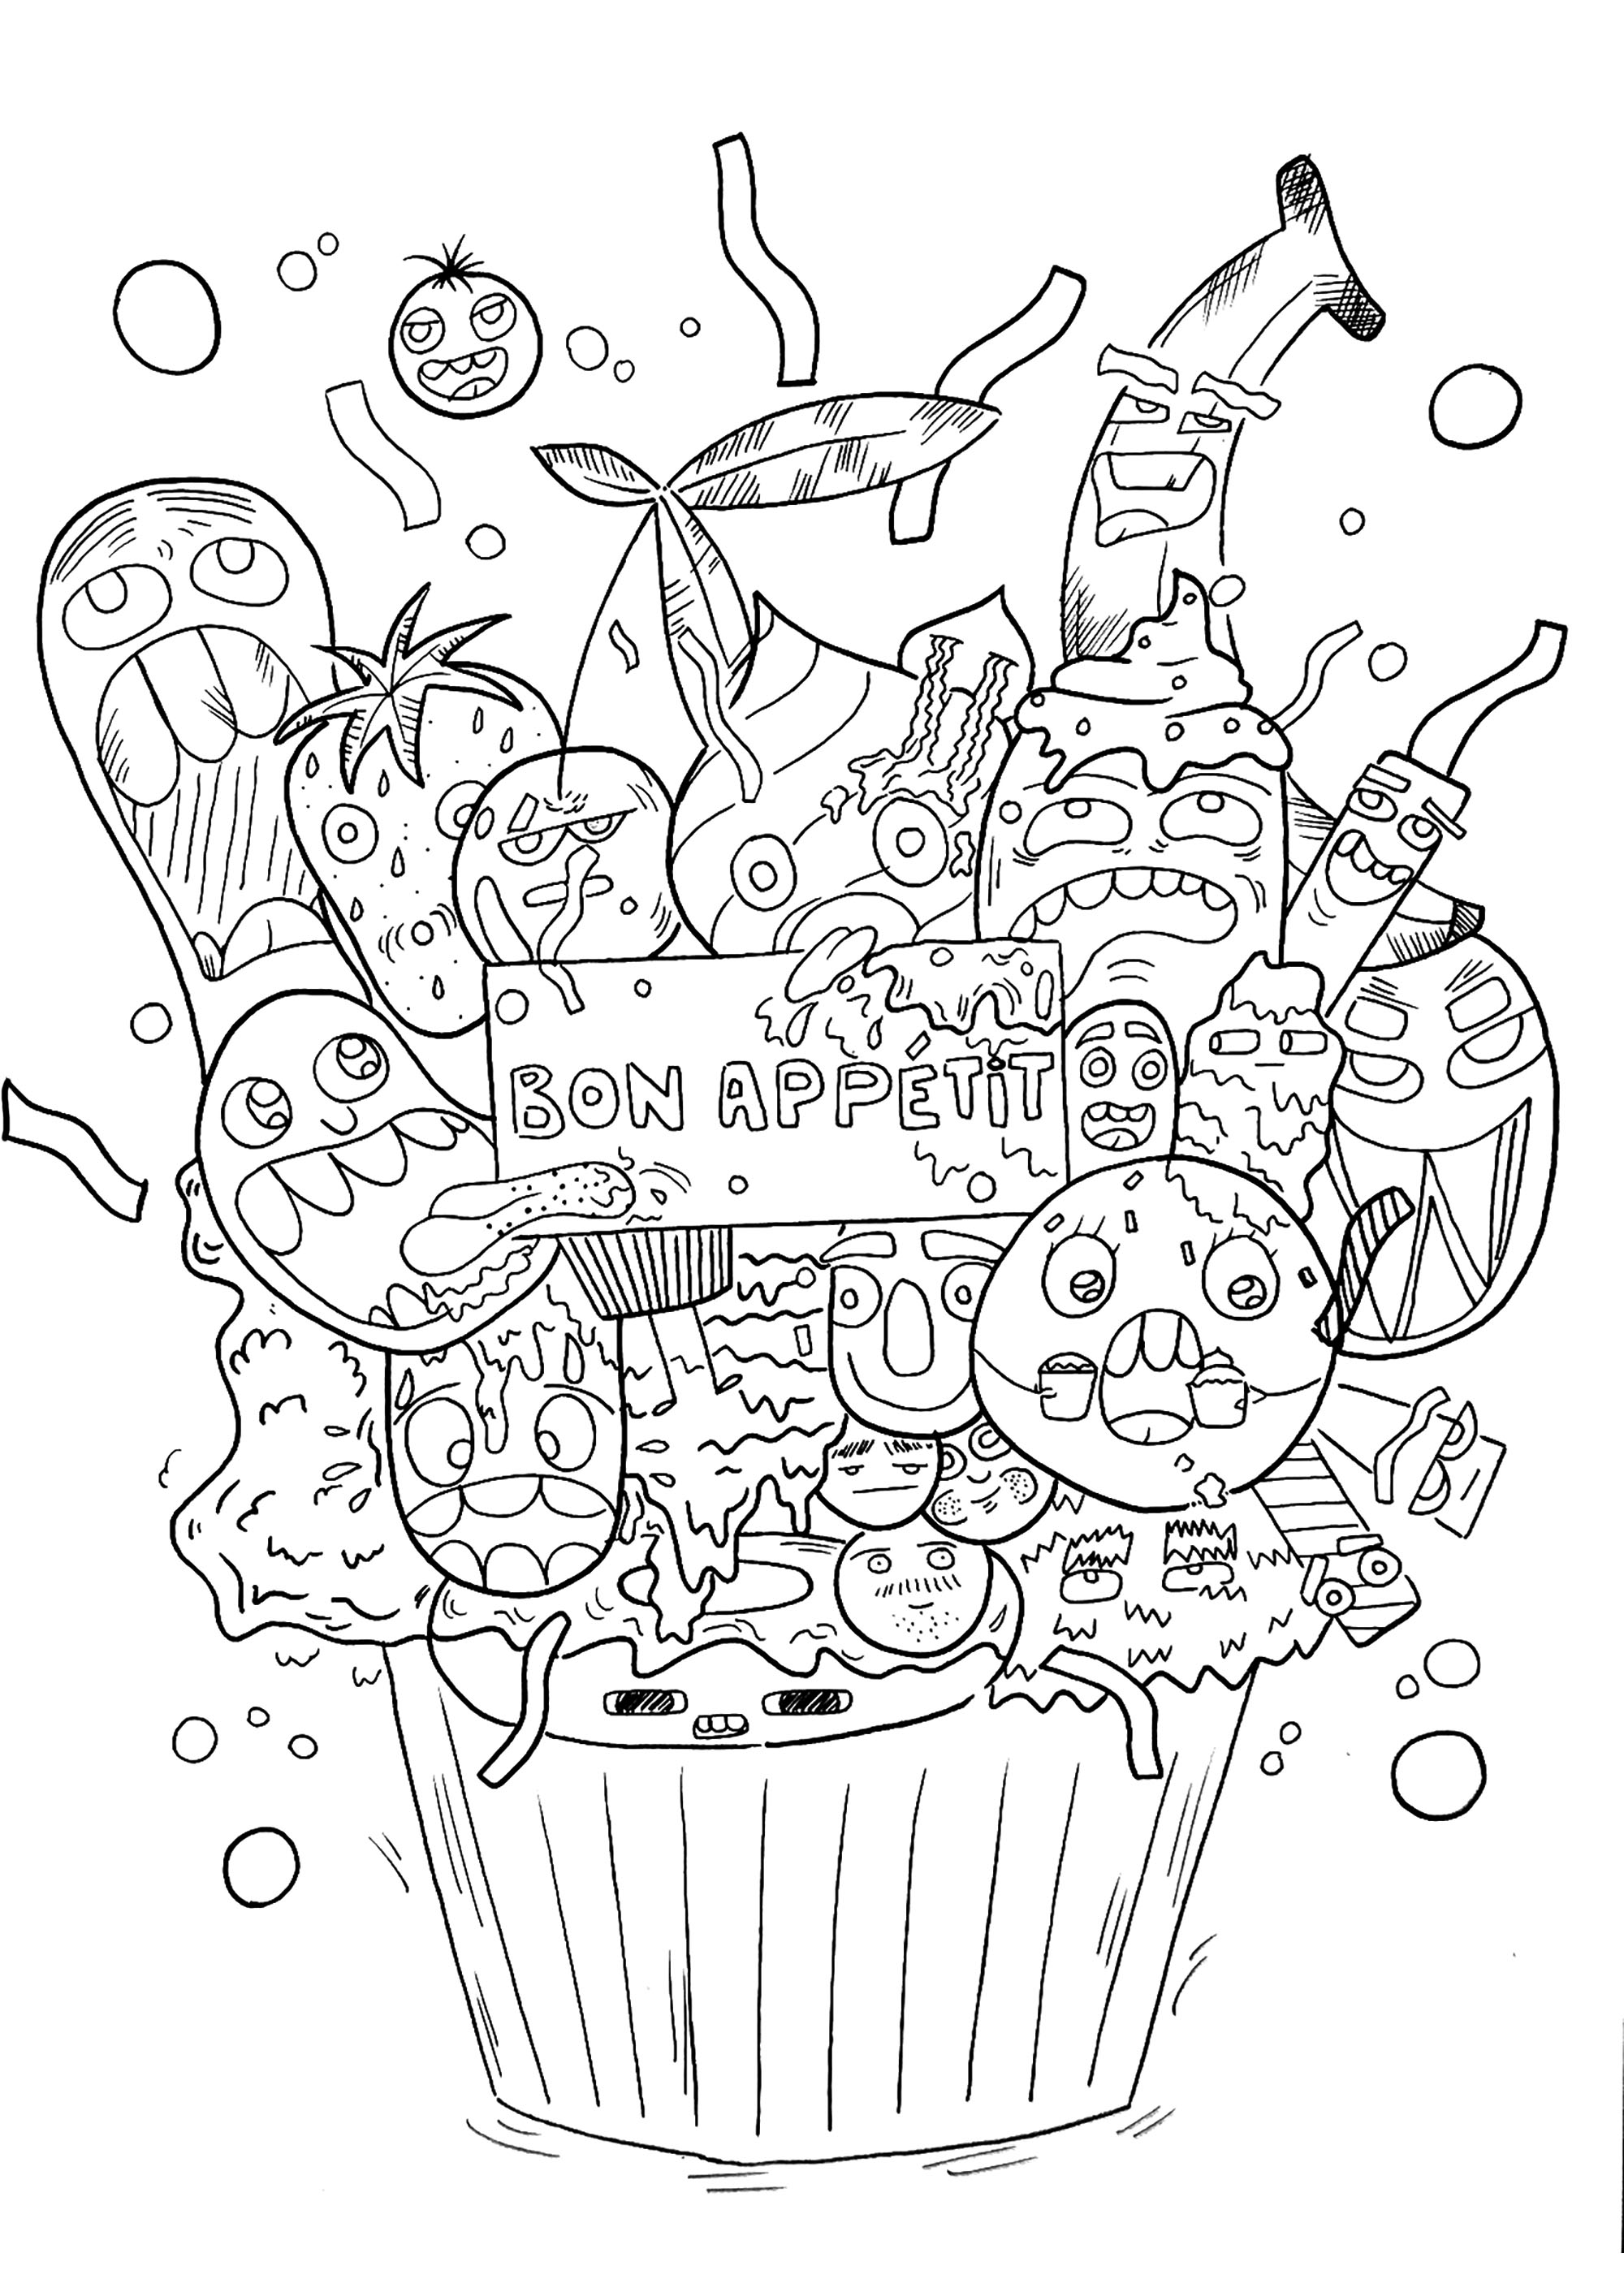 Doodle Art To Print